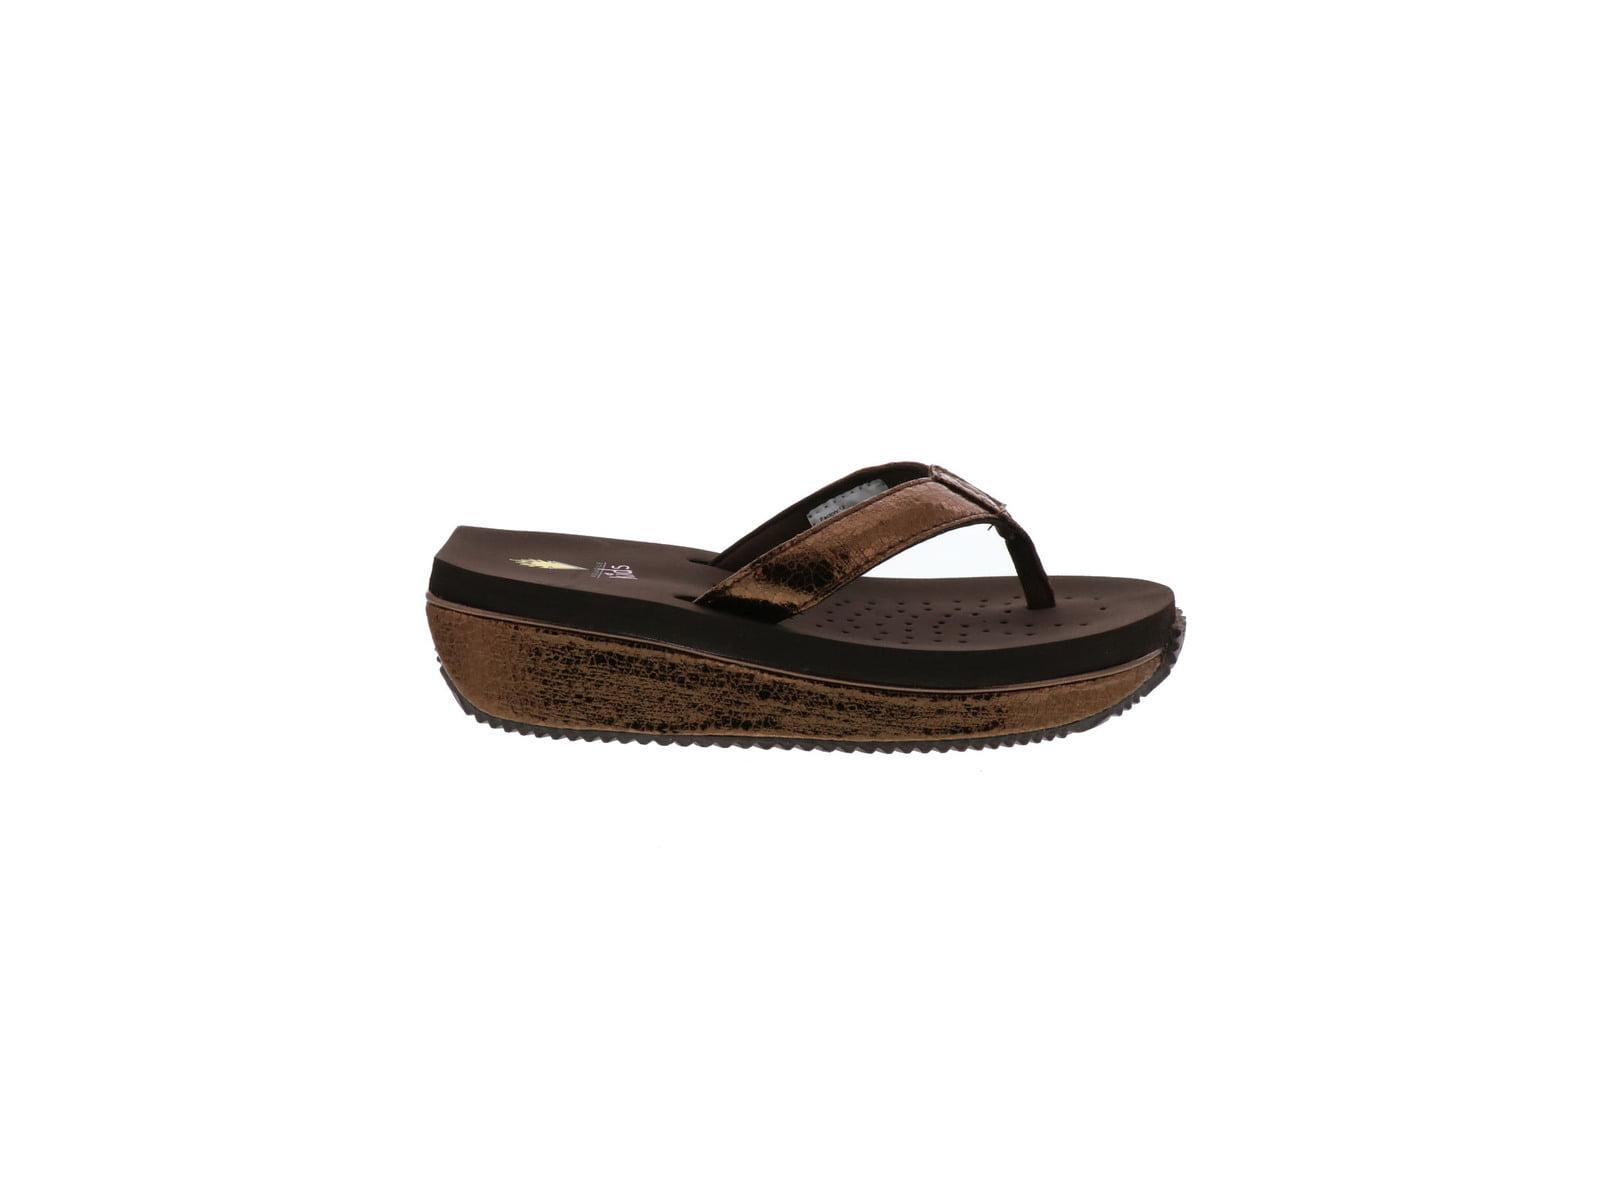 3b206662eb4 Kids Volatile Girls Powderpuff Slip On Wedge Sandals